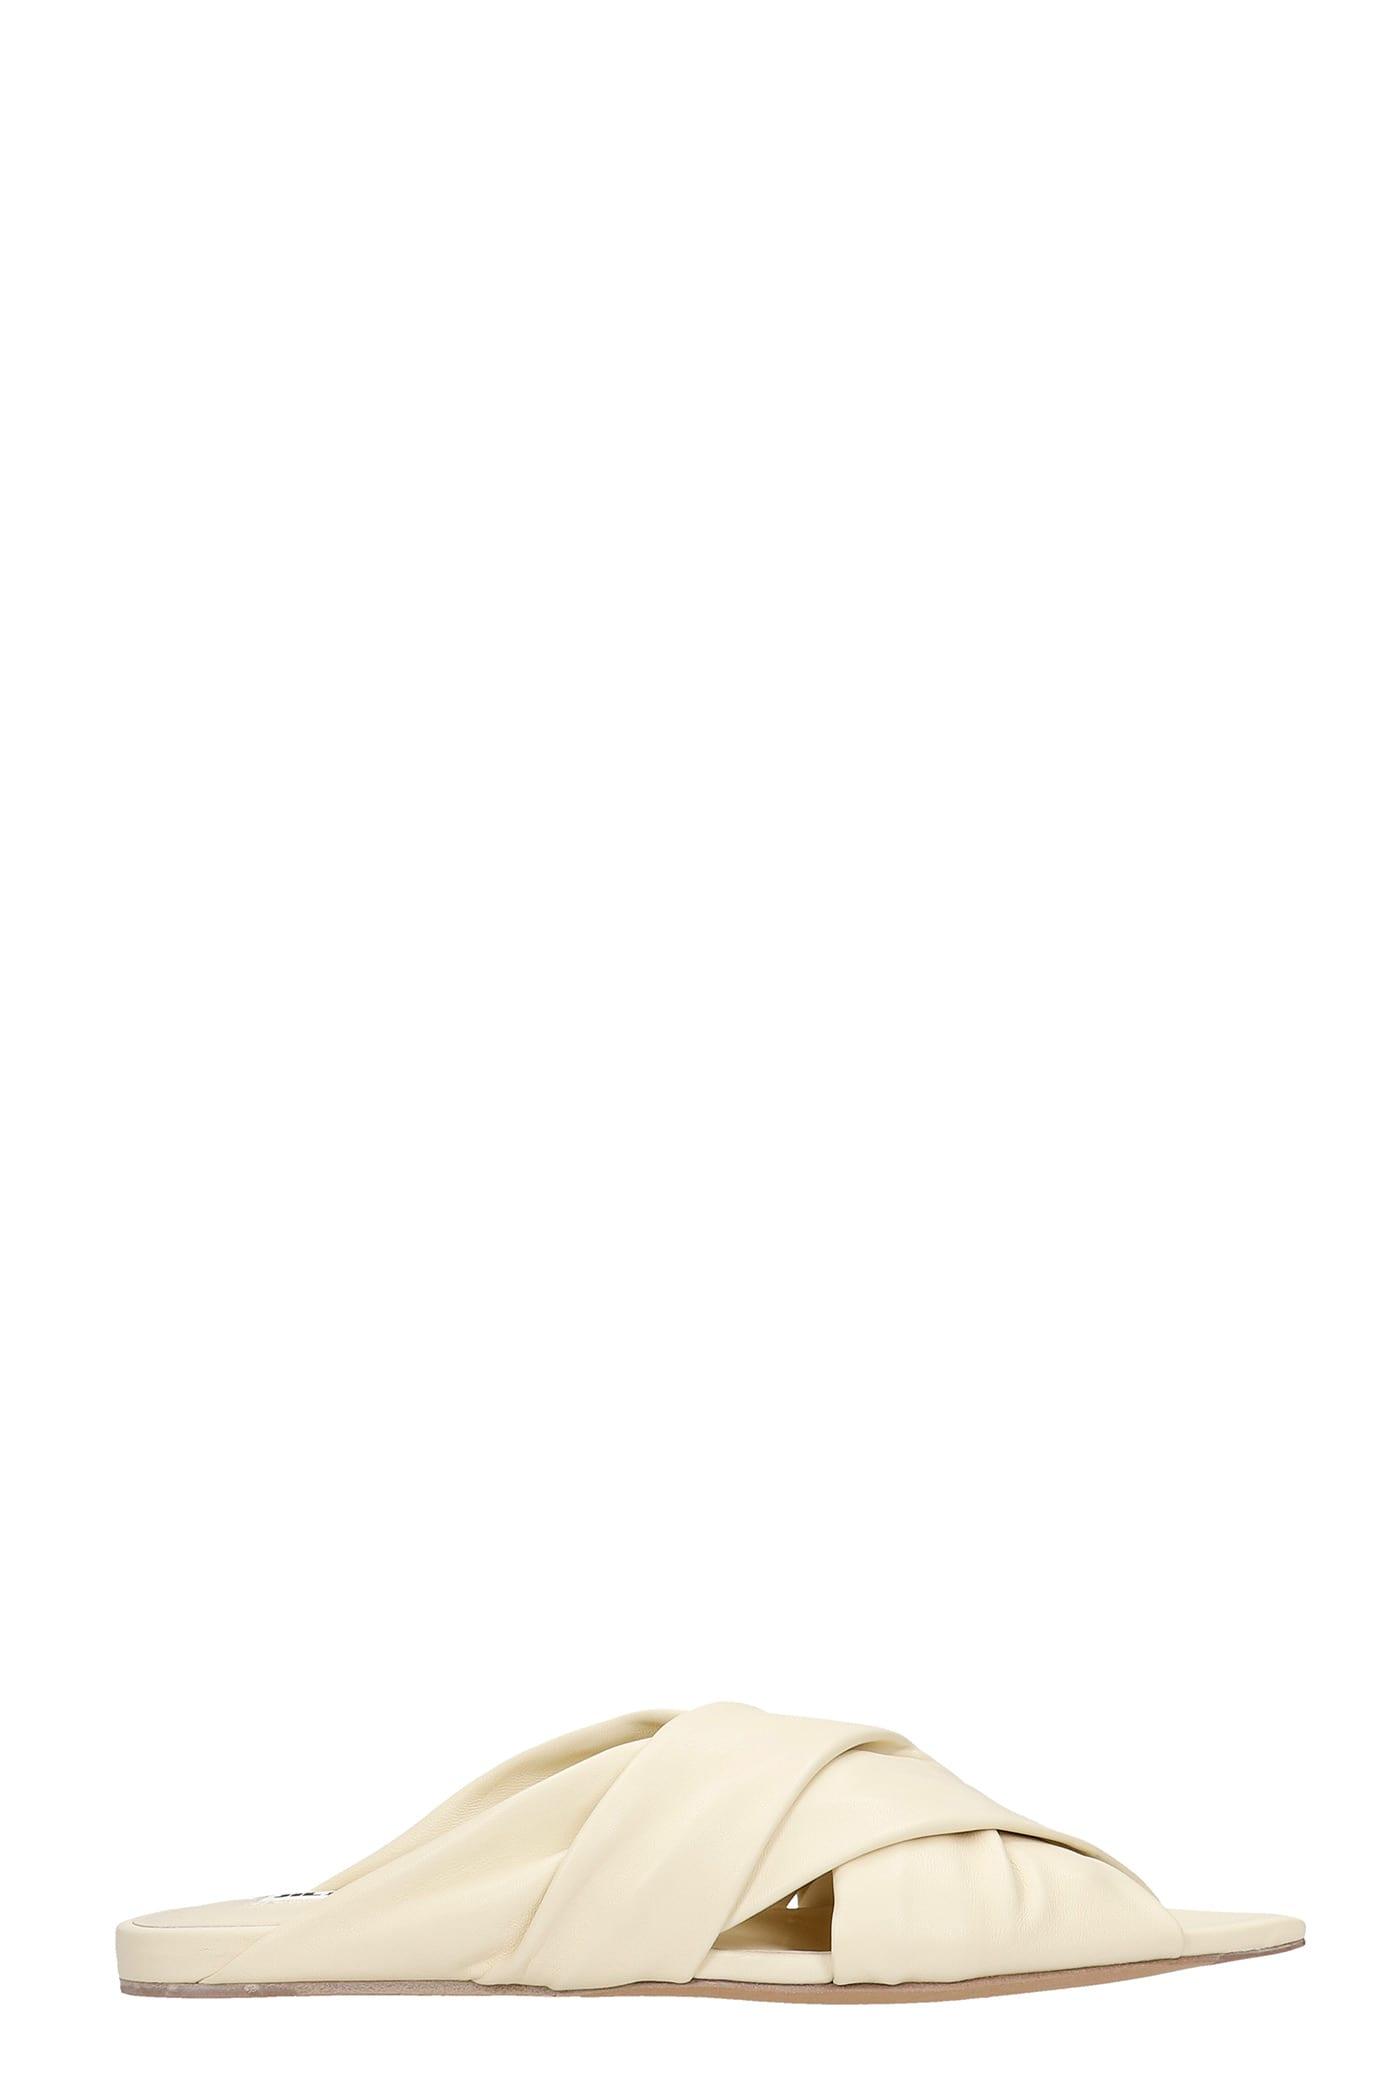 Buy Jil Sander Flats In Beige Leather online, shop Jil Sander shoes with free shipping